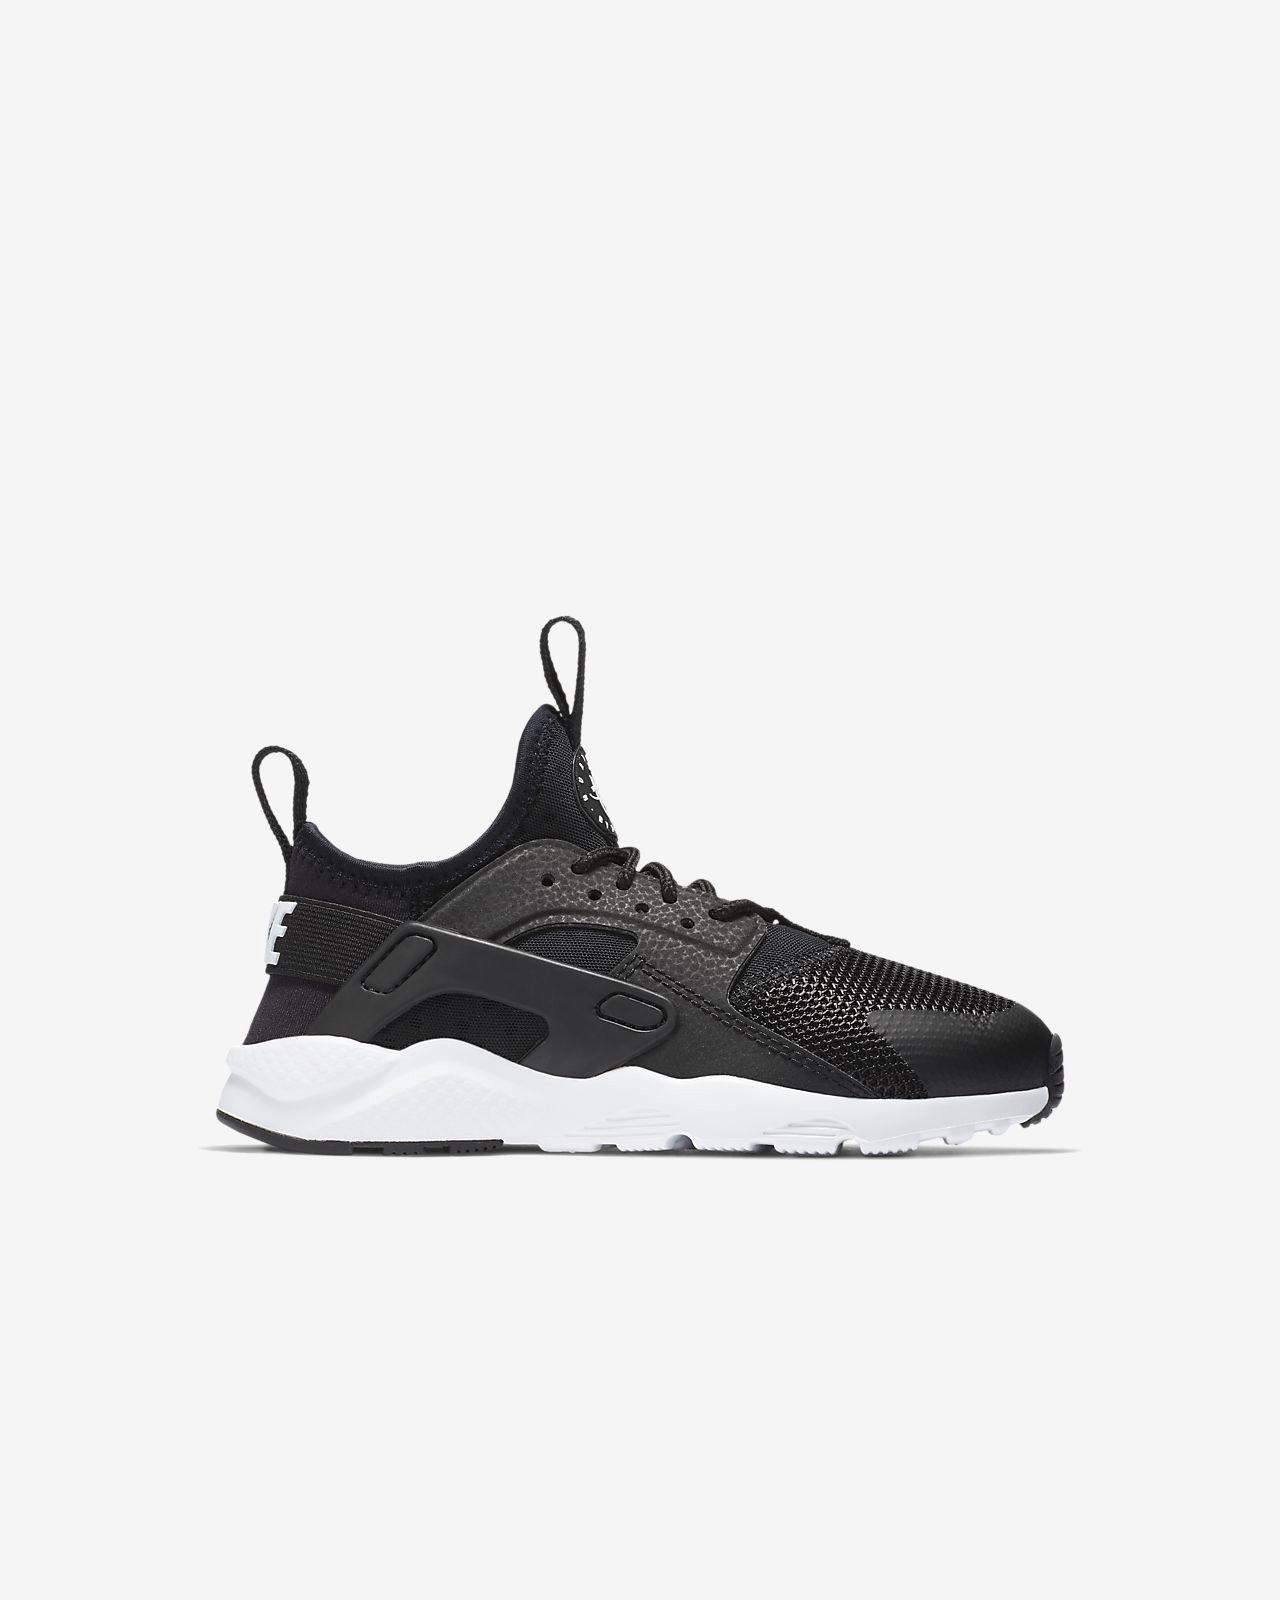 36d3fa97c6 Nike Huarache Ultra Little Kids' Shoe - 11C | Products | Discount ...